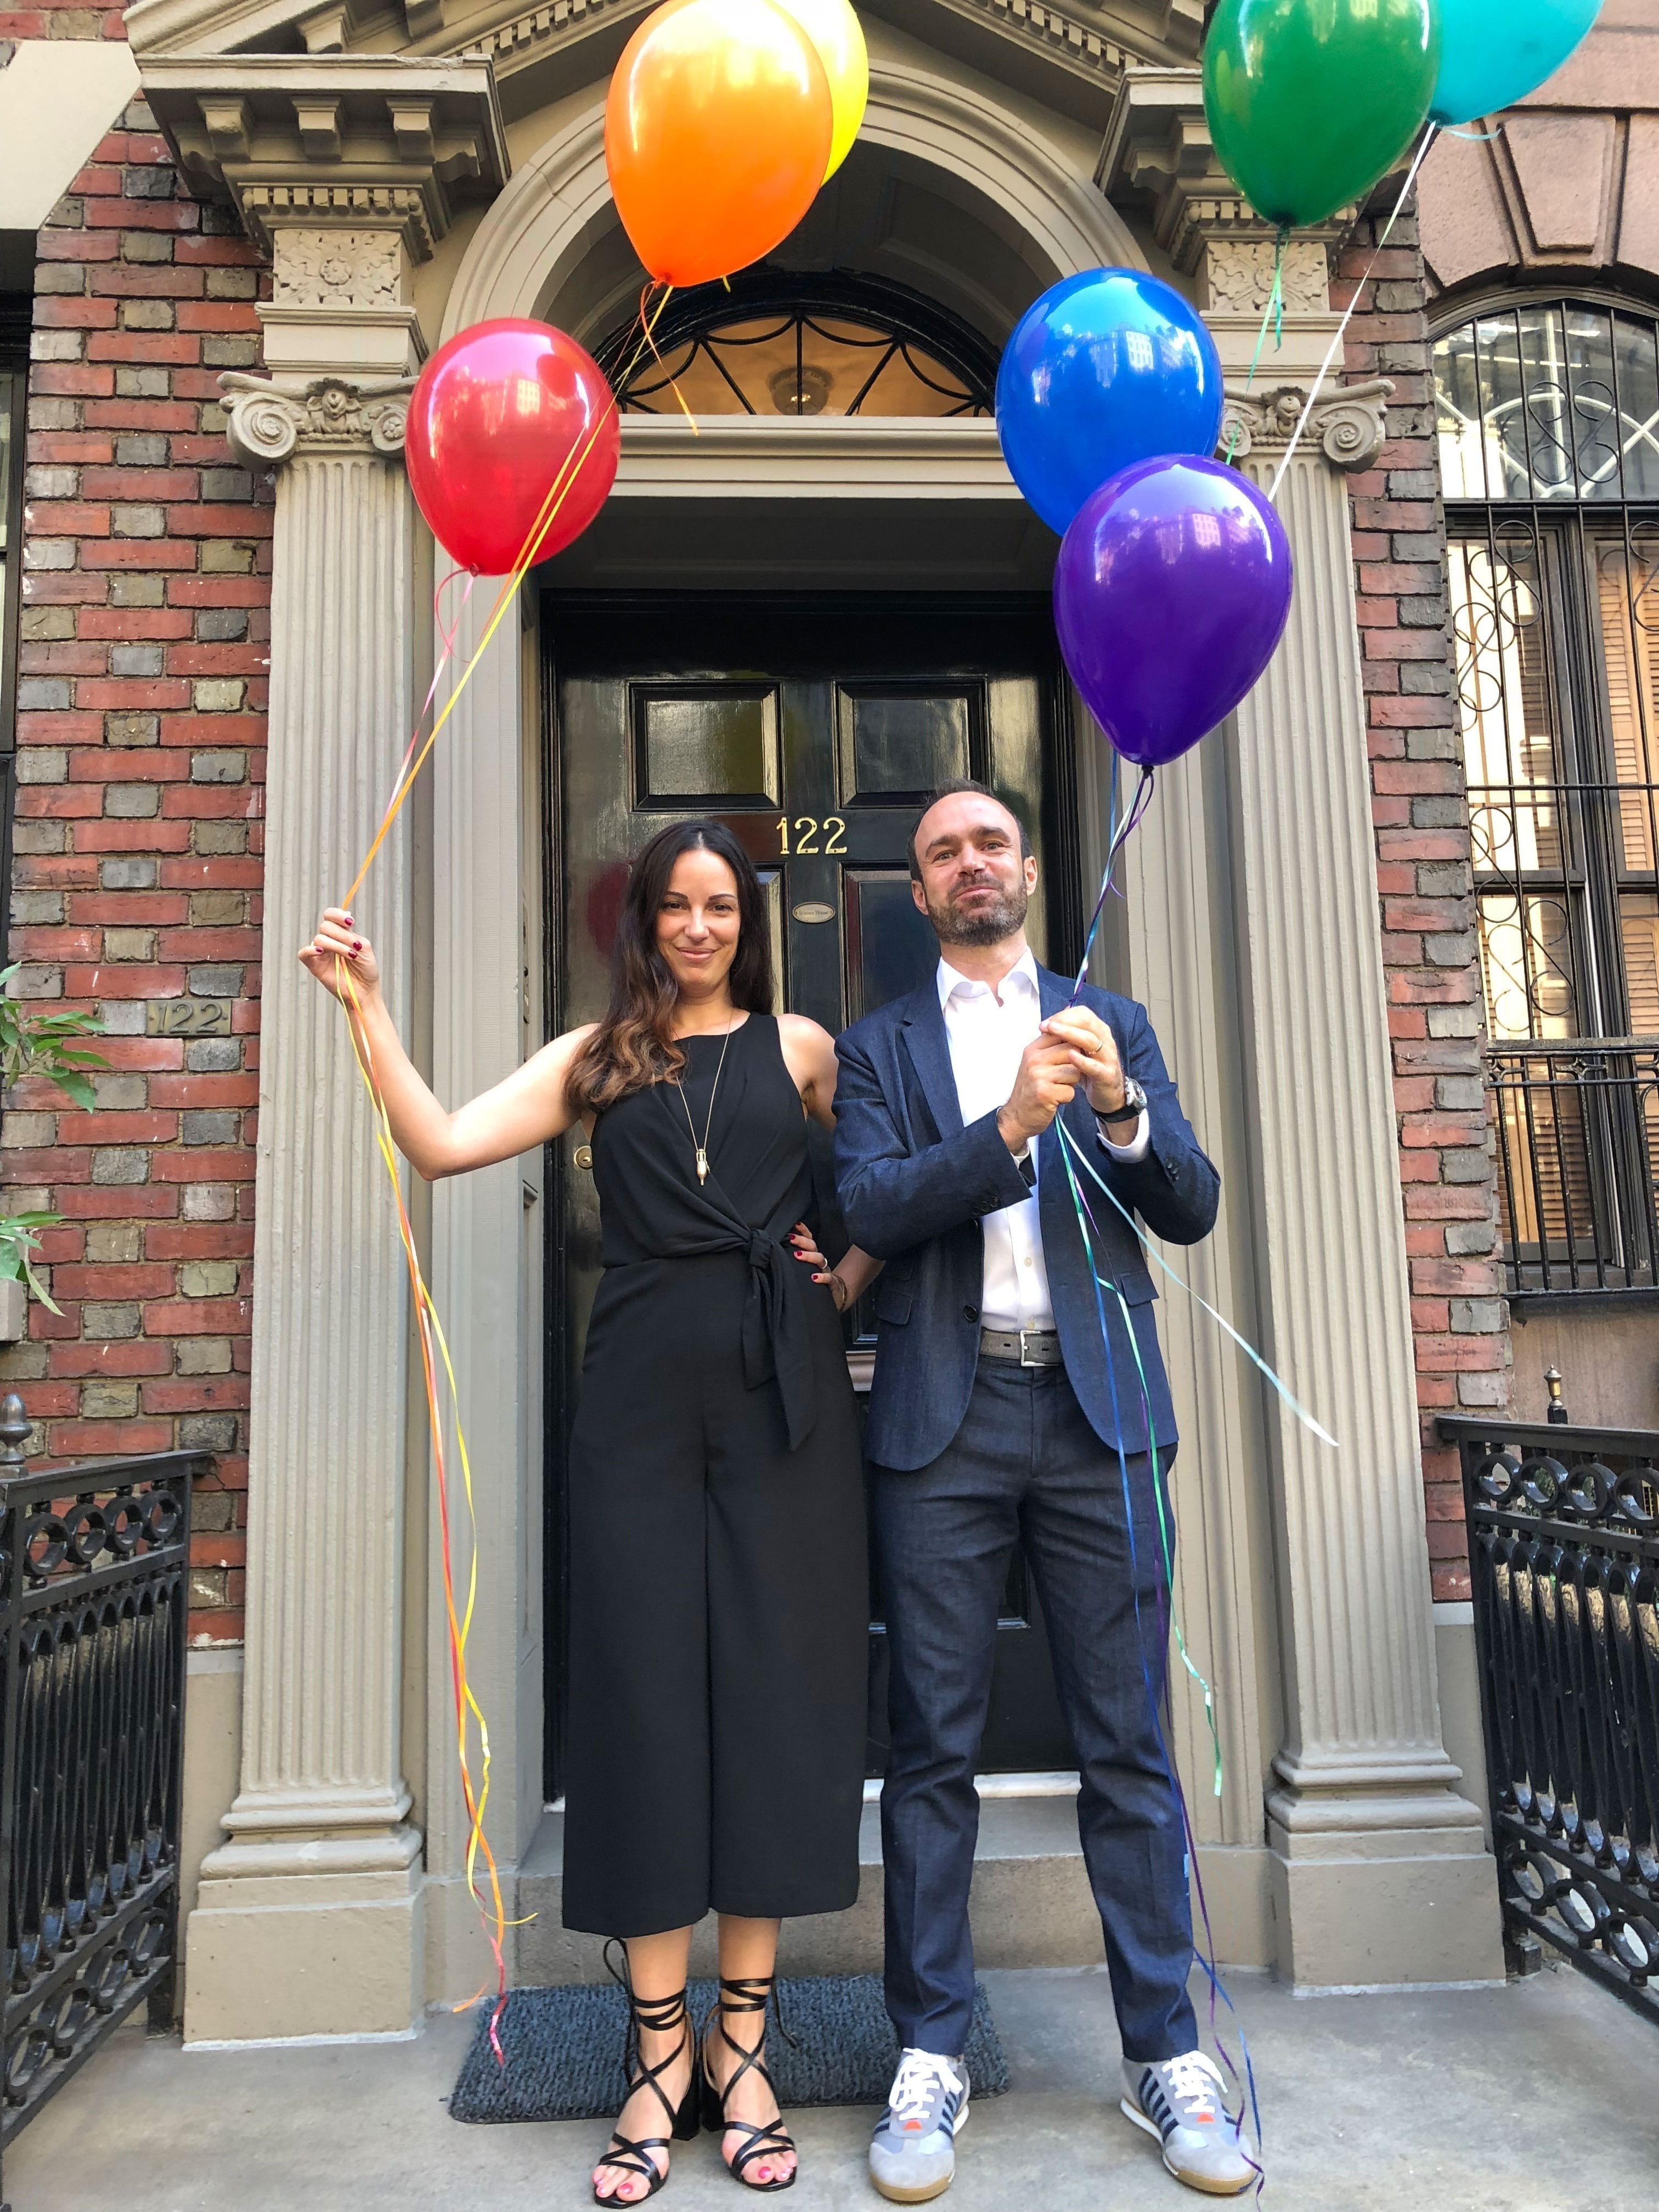 Balloon New York front porch - Simon Sagmeister